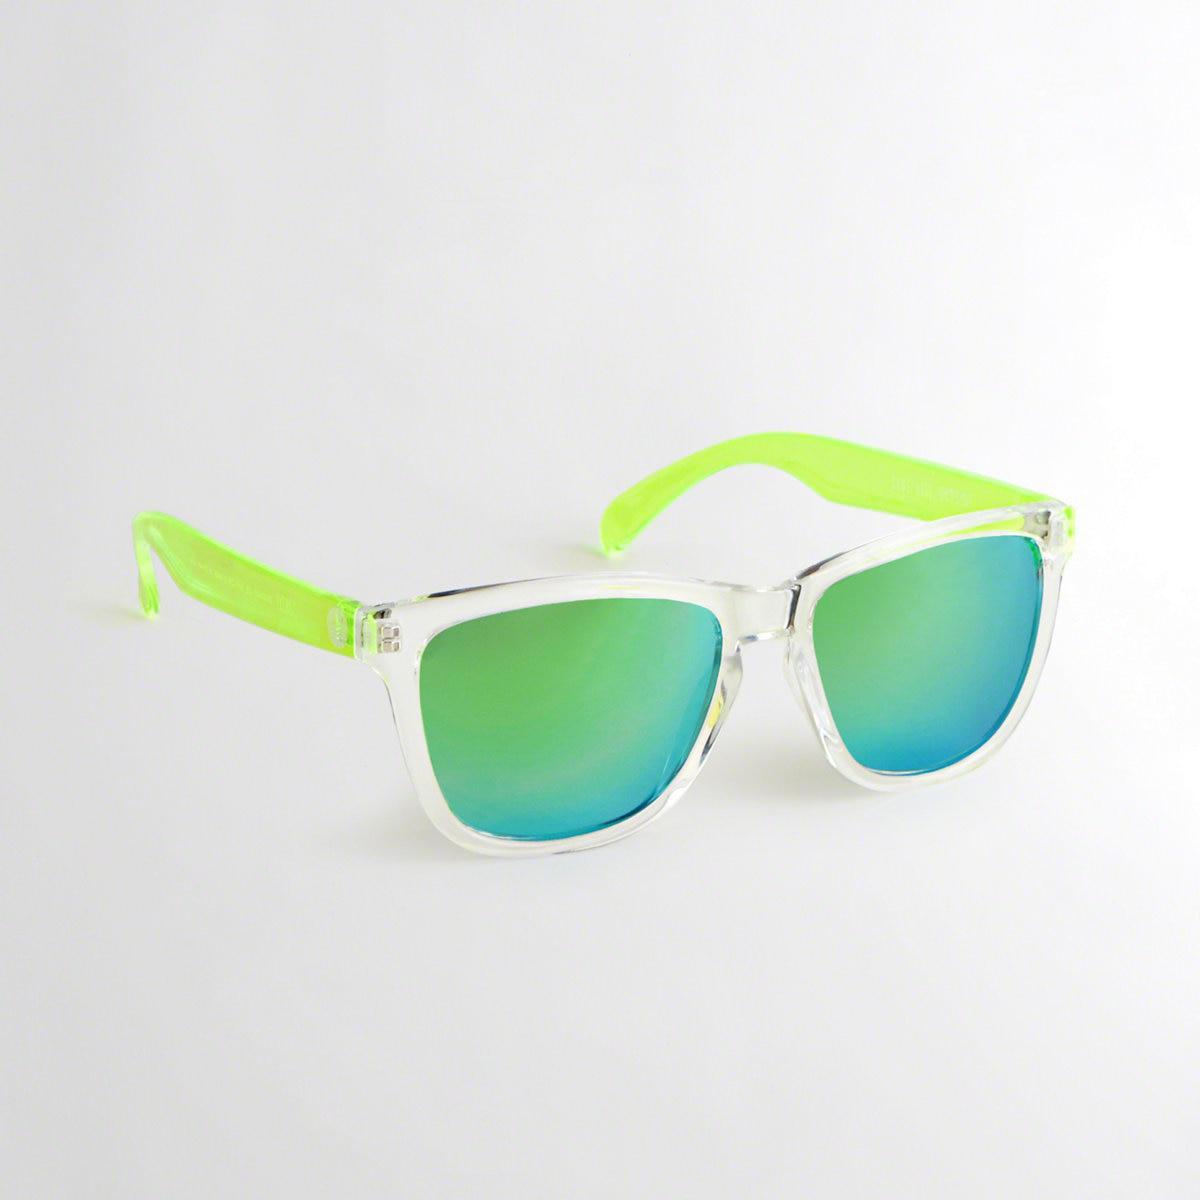 b7dcb06d9a2 Lyst - Hollister Guys Sunski Original Sunglasses From Hollister in ...